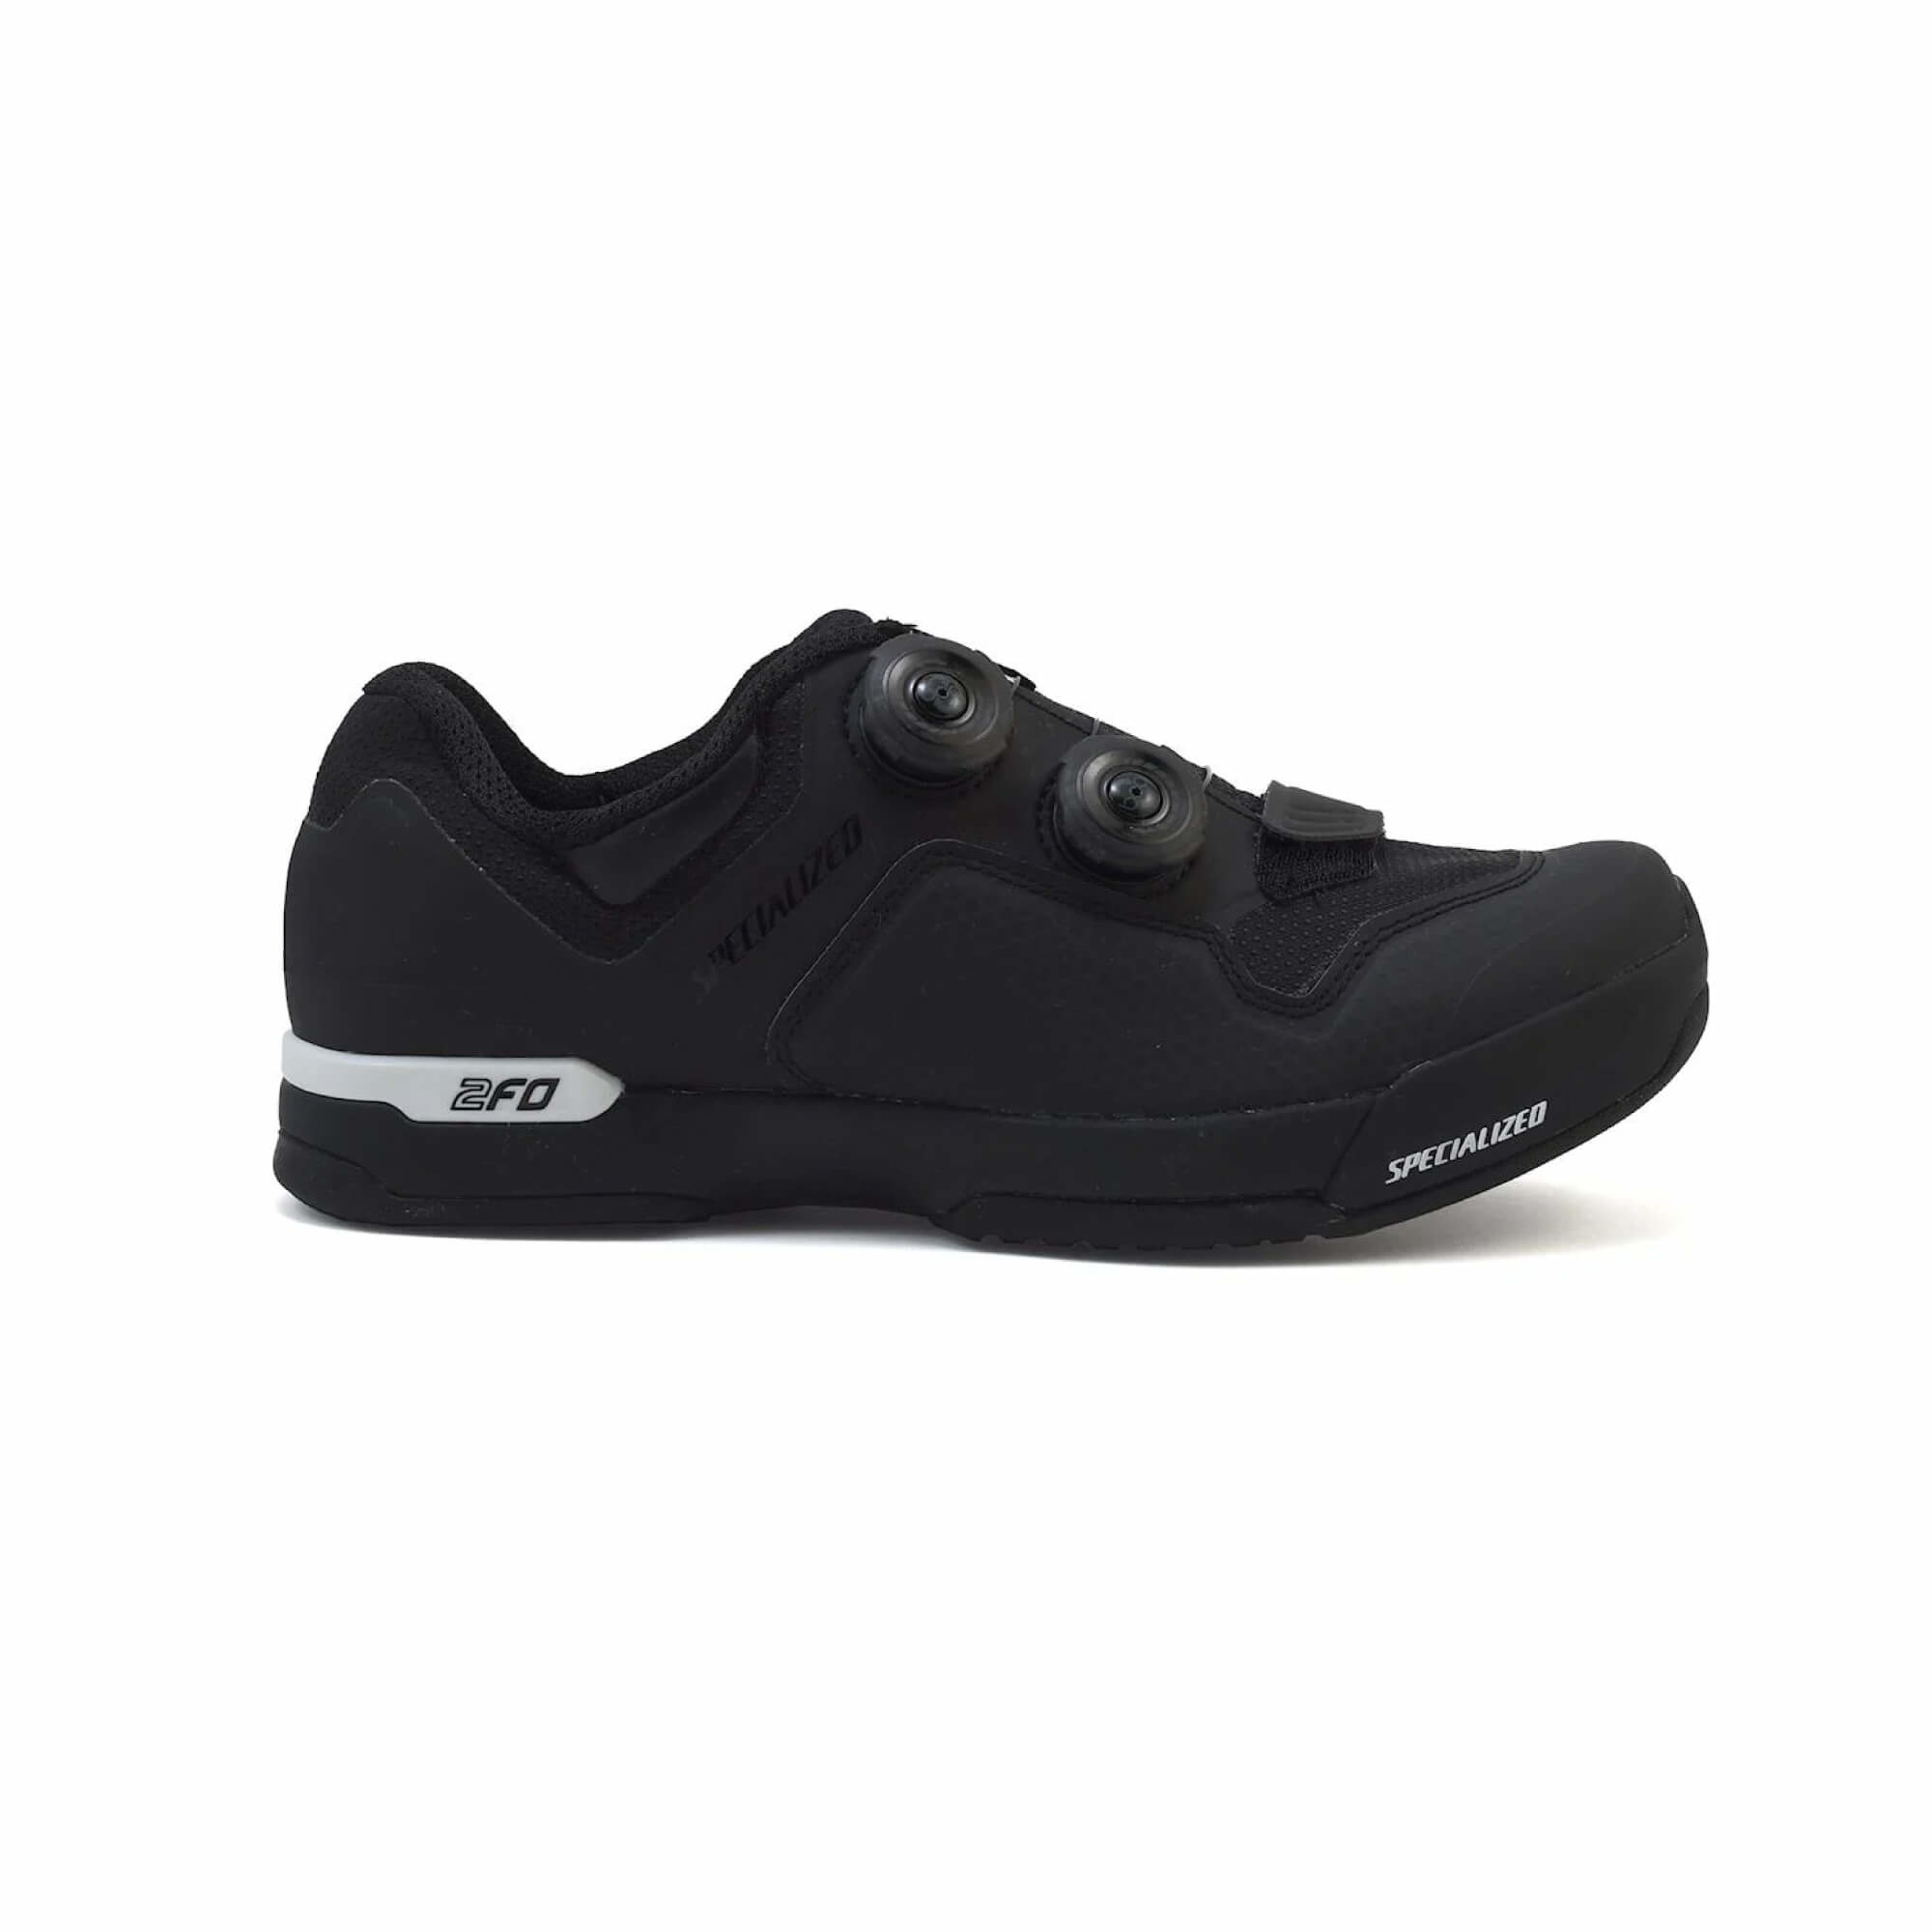 2FO Cliplite MTB Shoe 2019-1